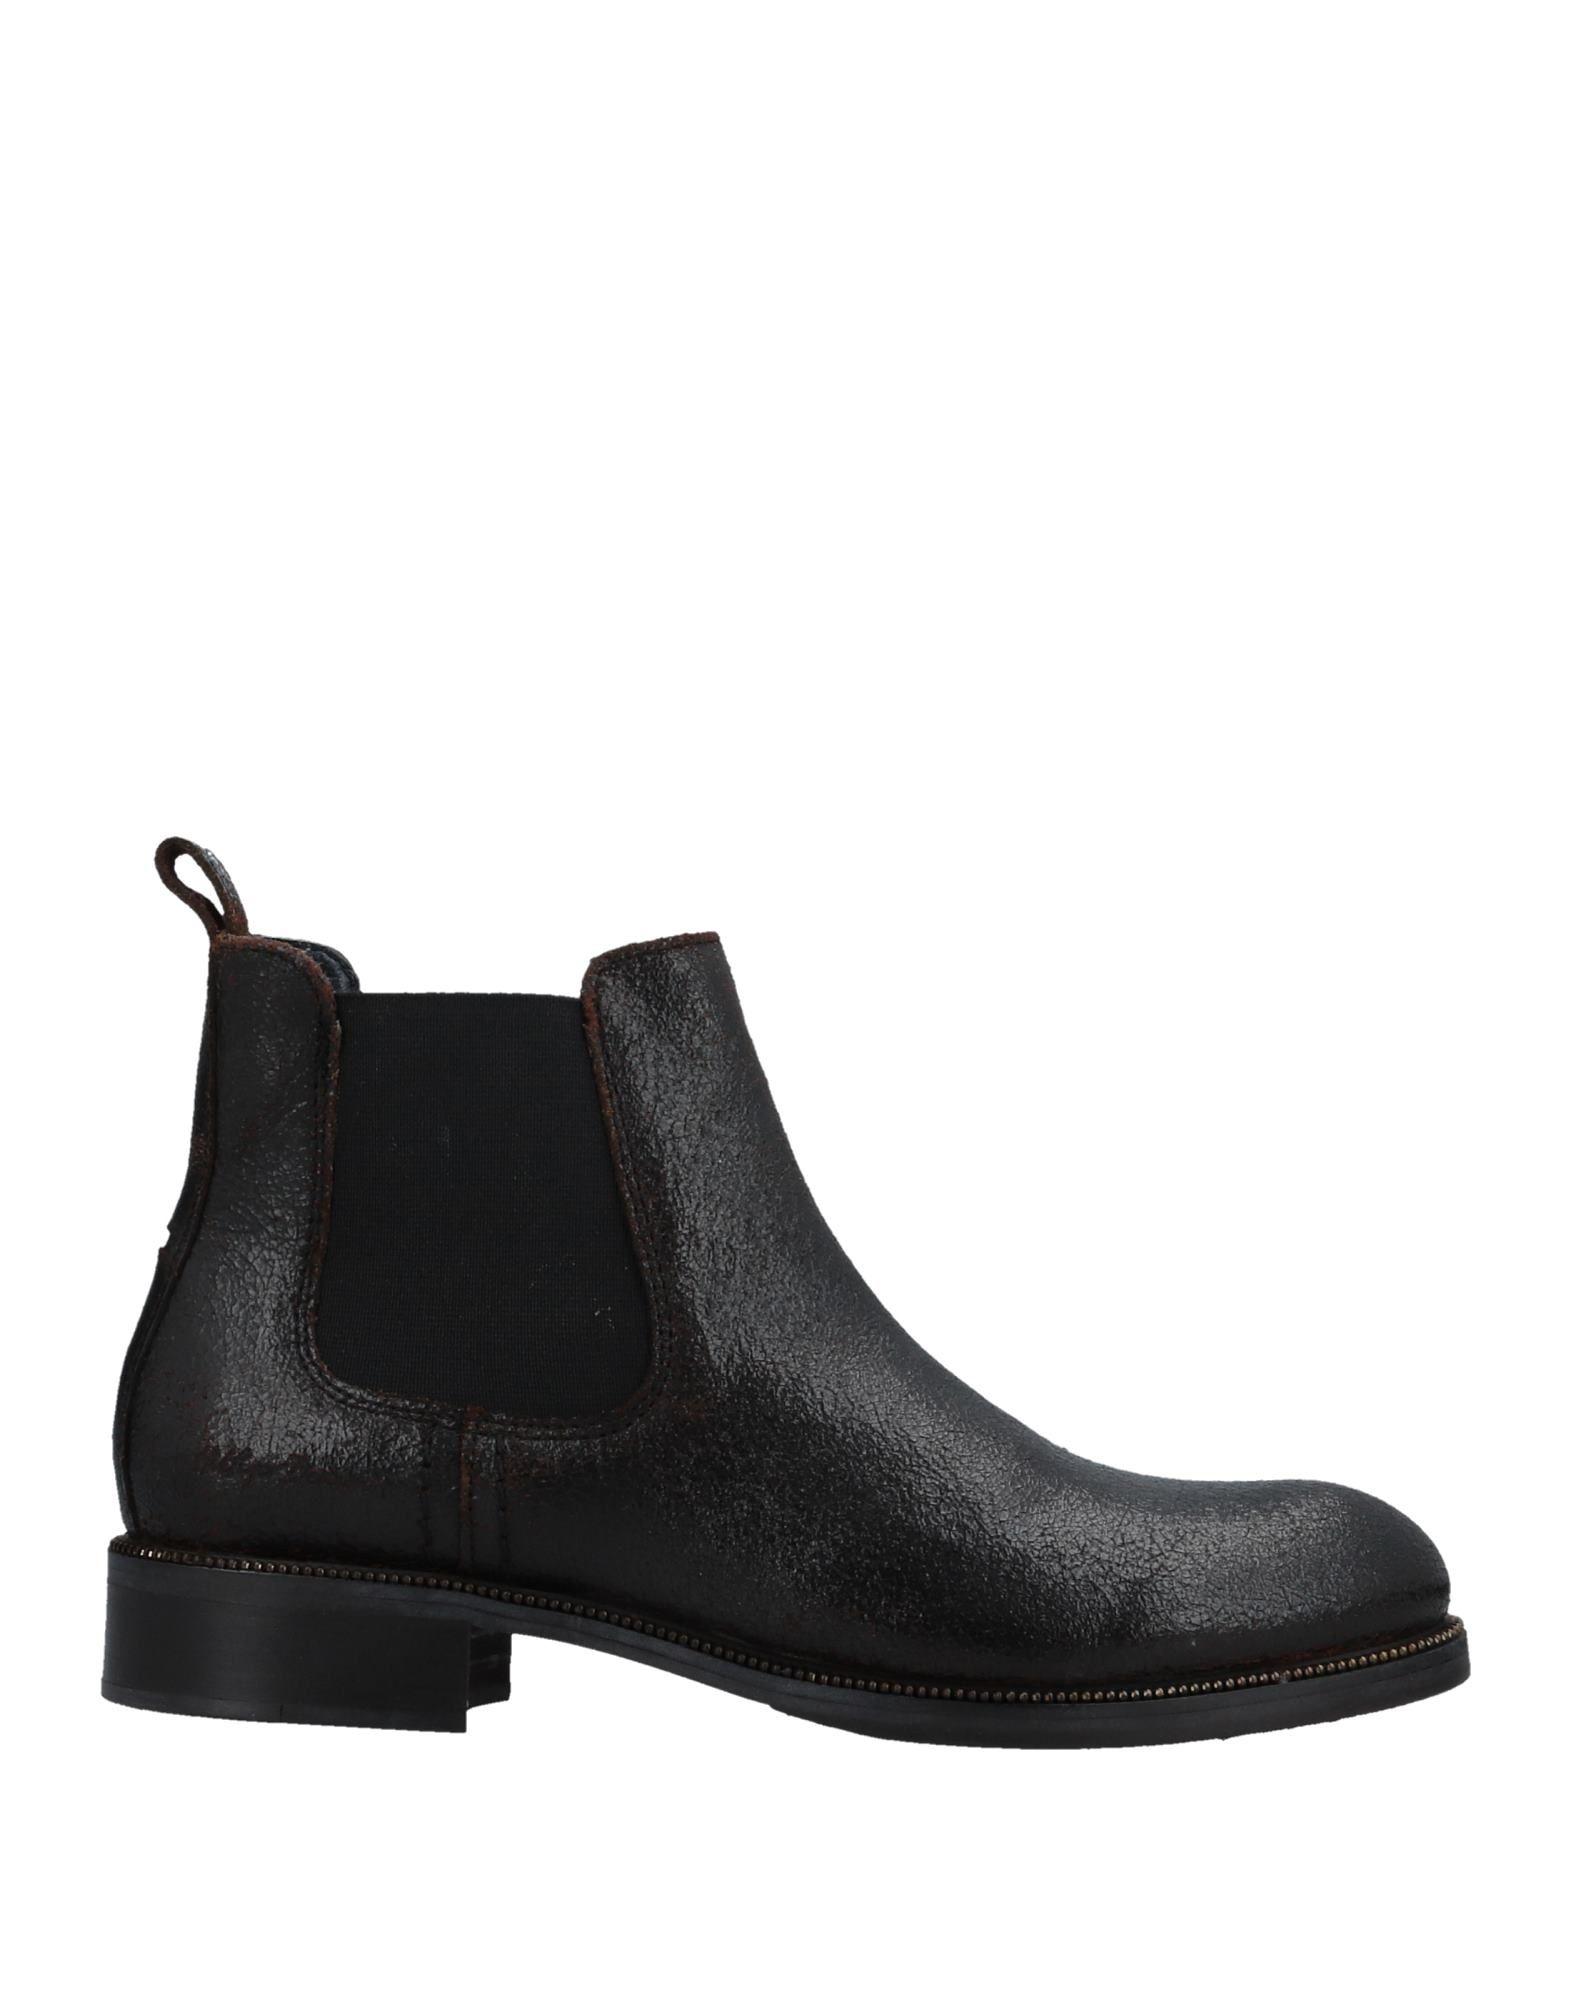 TOMMY JEANS Полусапоги и высокие ботинки tommy hilfiger полусапоги и высокие ботинки